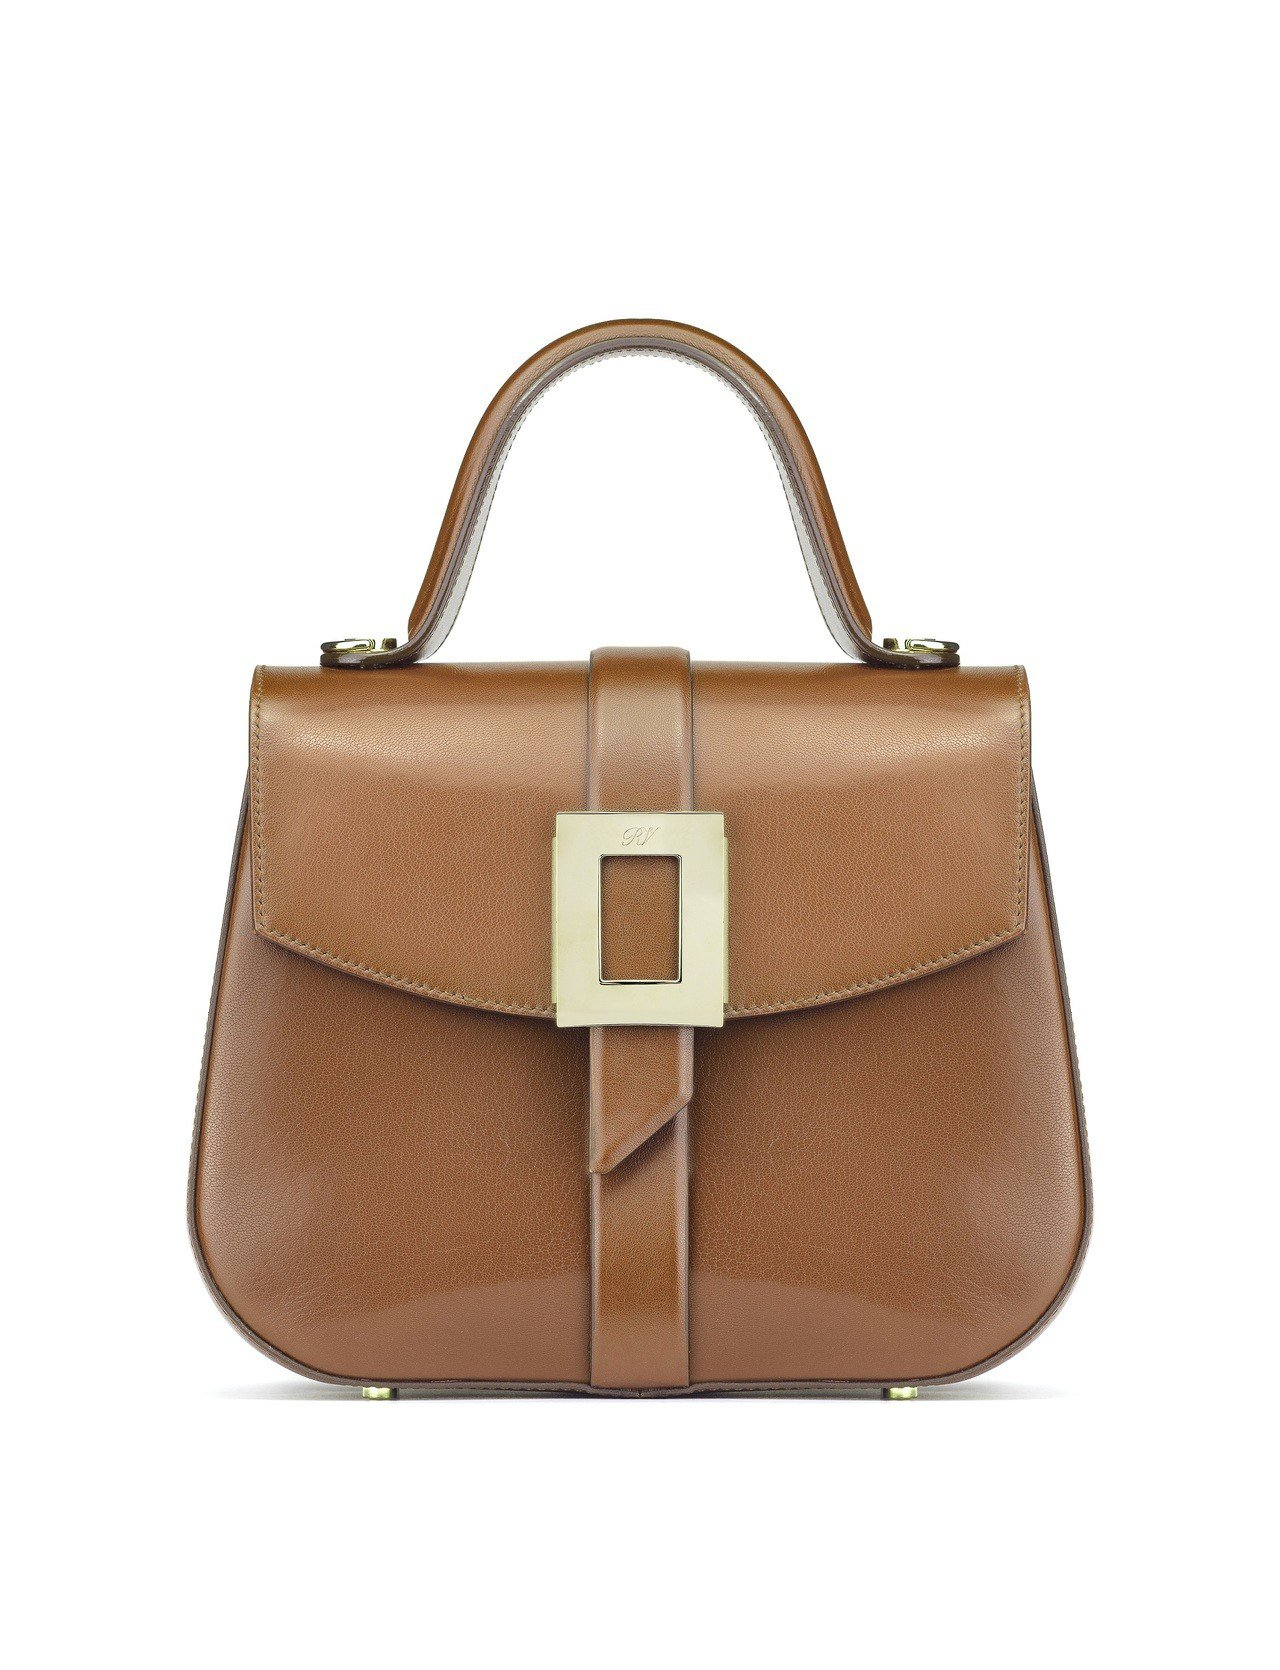 Roger Vivier Beau Vivier牛皮手提包,售價11萬元。圖/R...